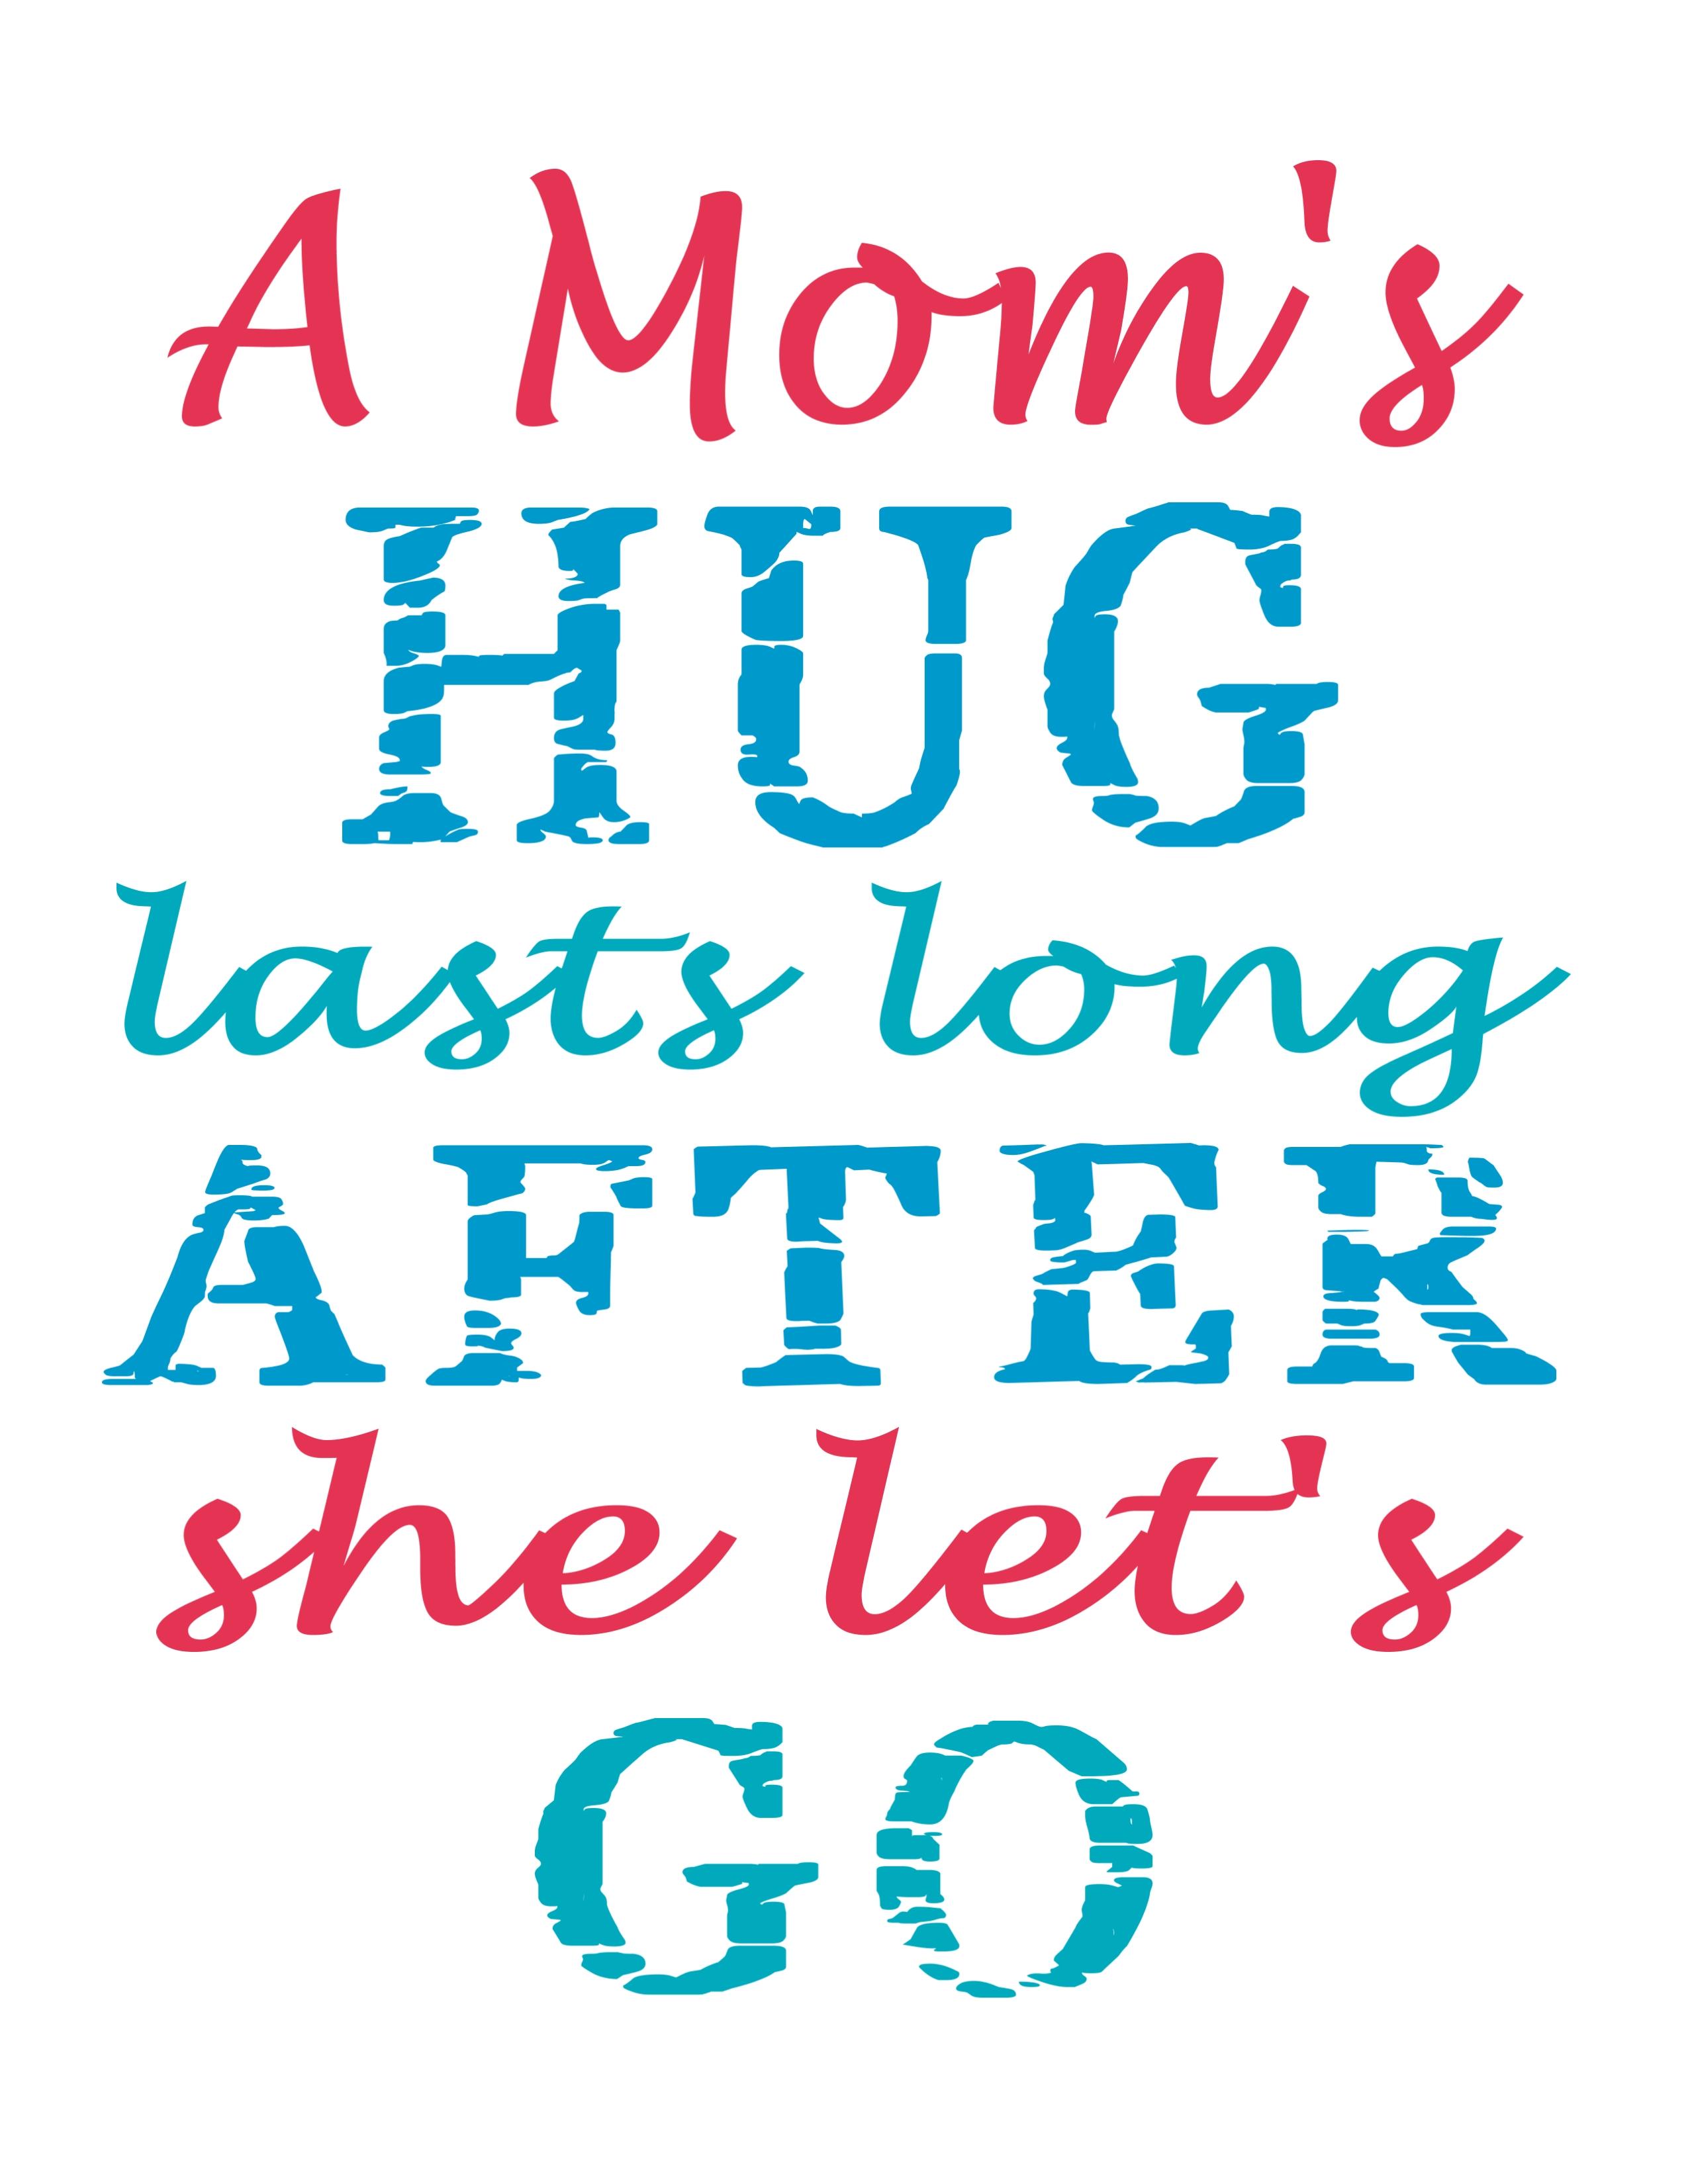 MothersDaySubway3-001